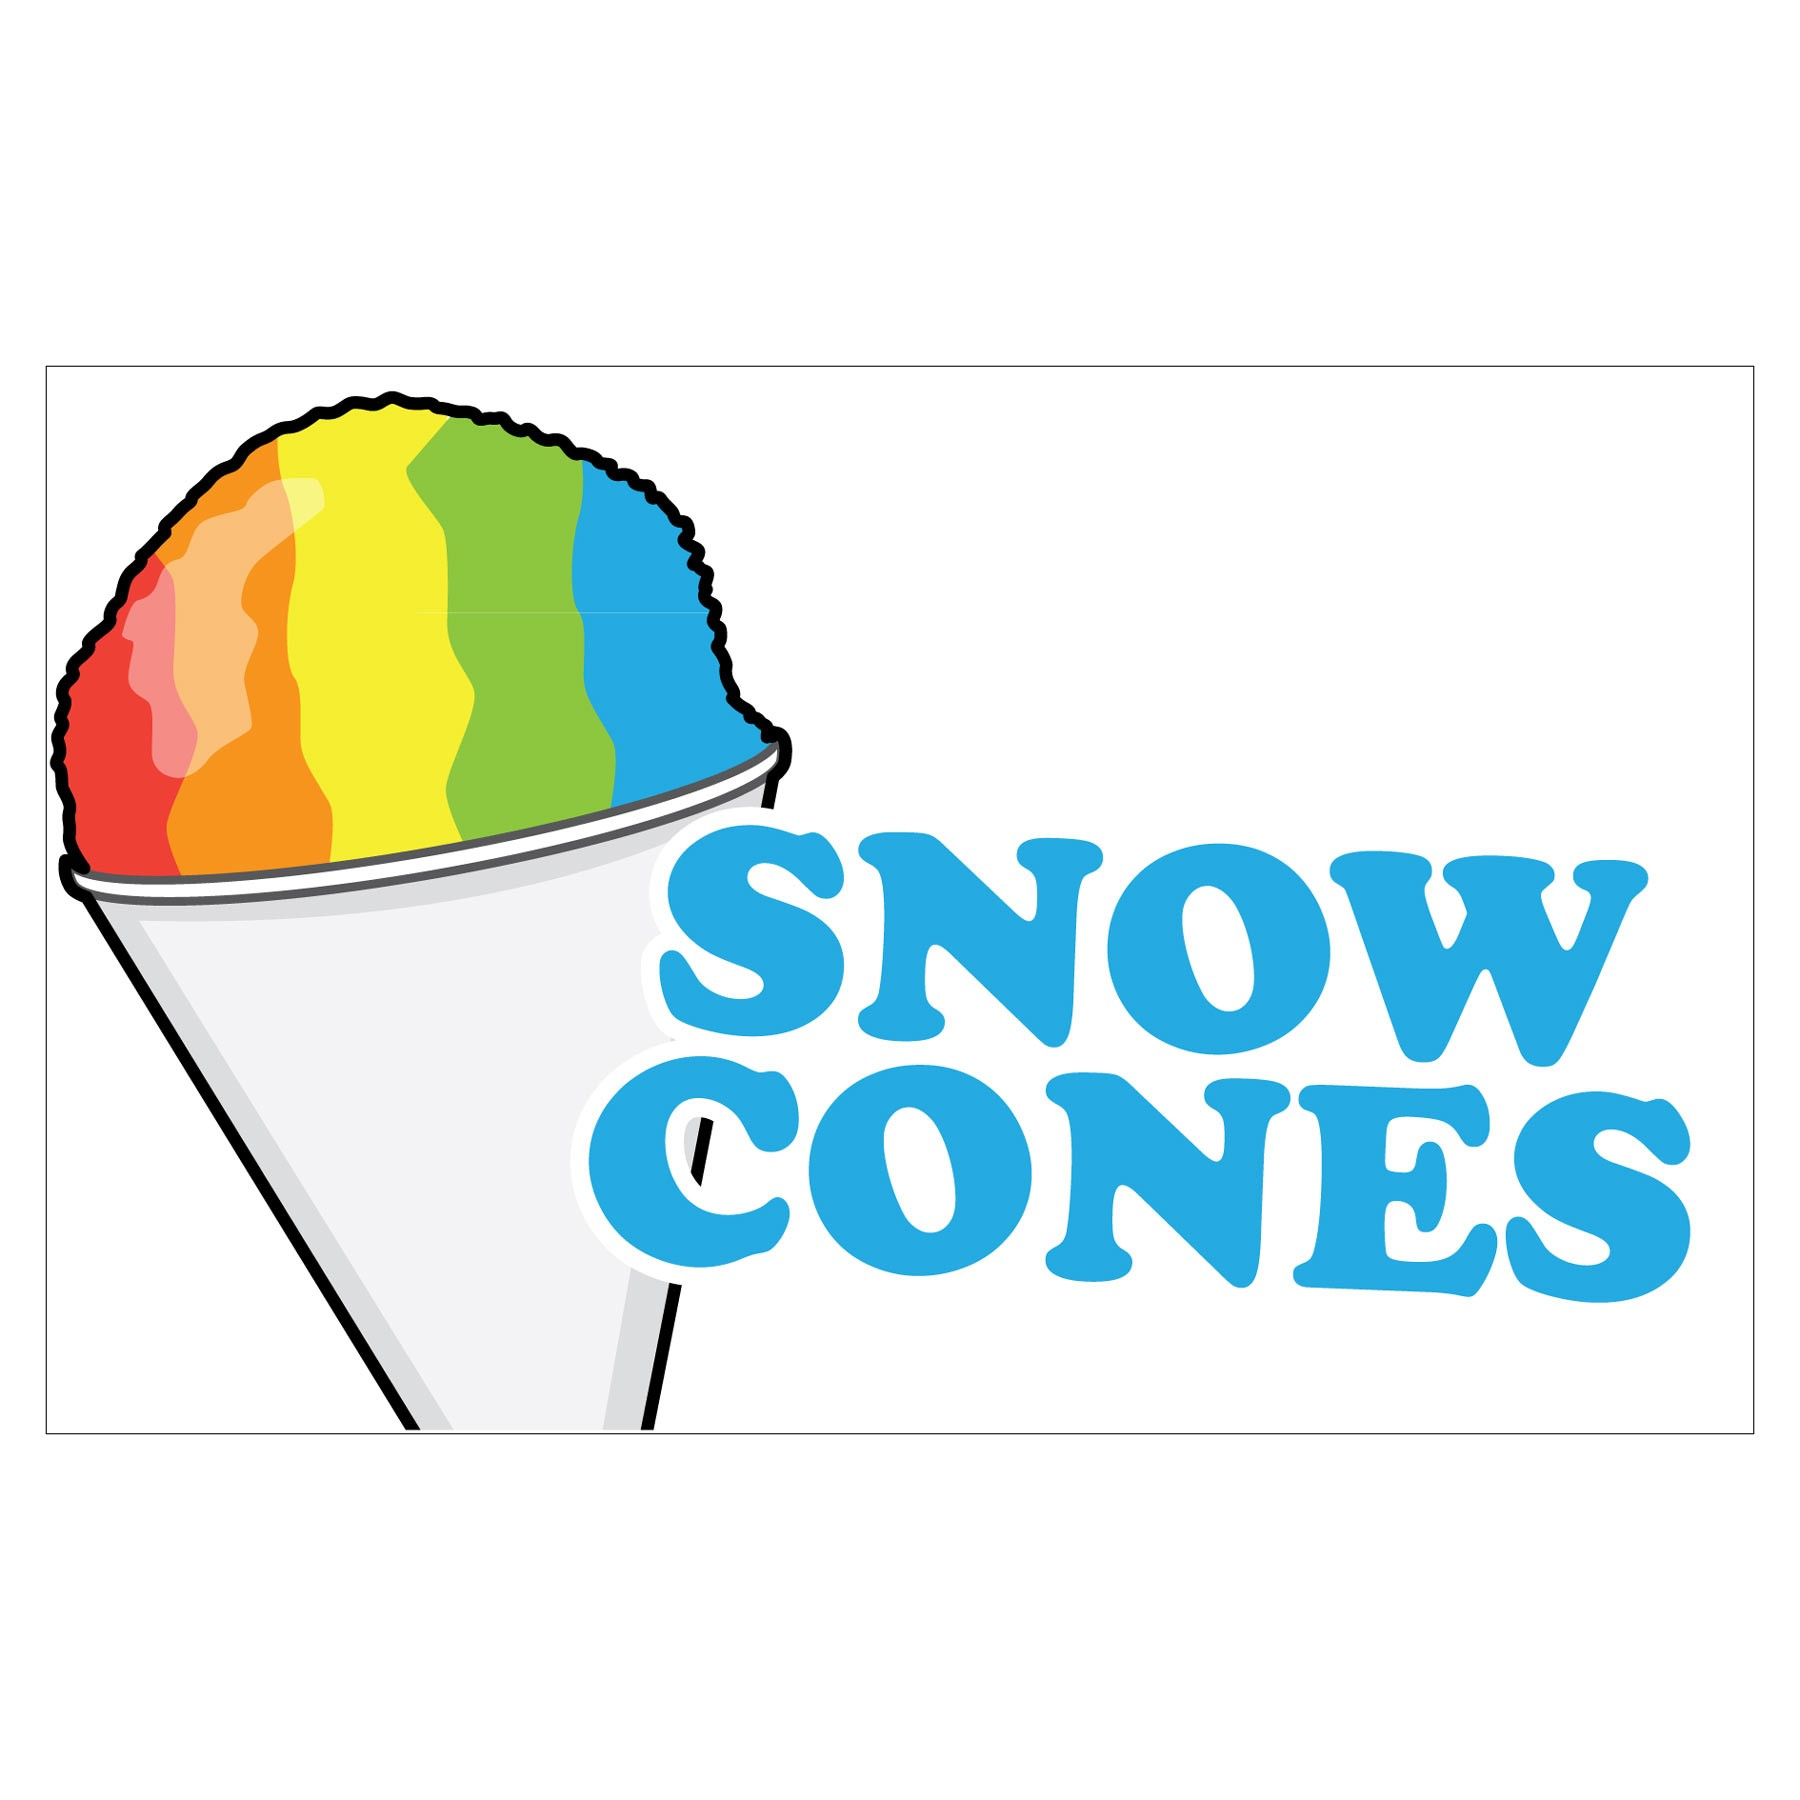 10 Snow Cone Clip Art Free Free Cliparts-10 Snow Cone Clip Art Free Free Cliparts That You Can Download To-0